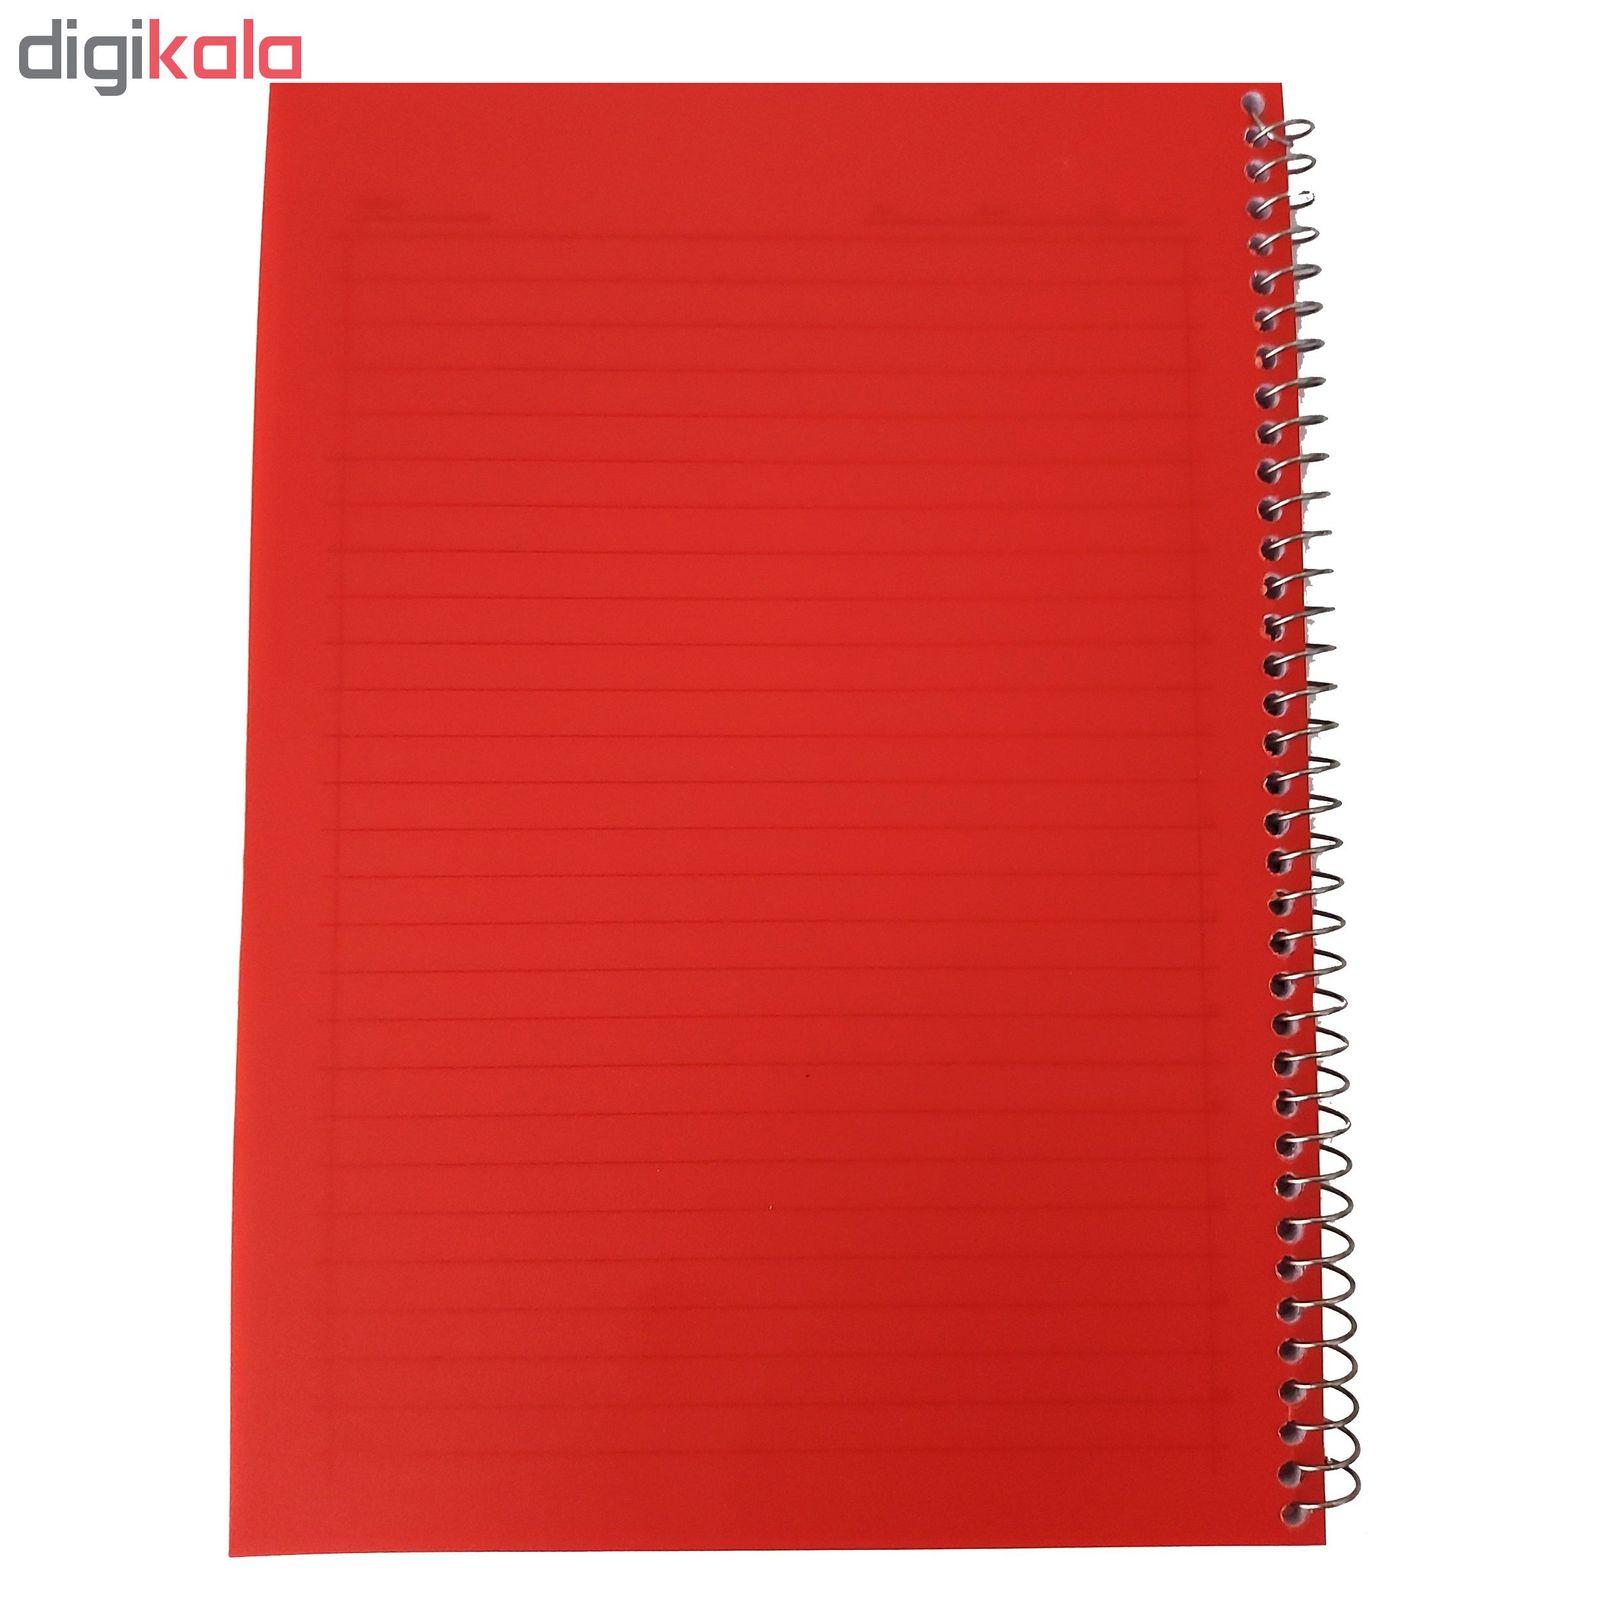 دفتر مشق کد DM02 main 1 7